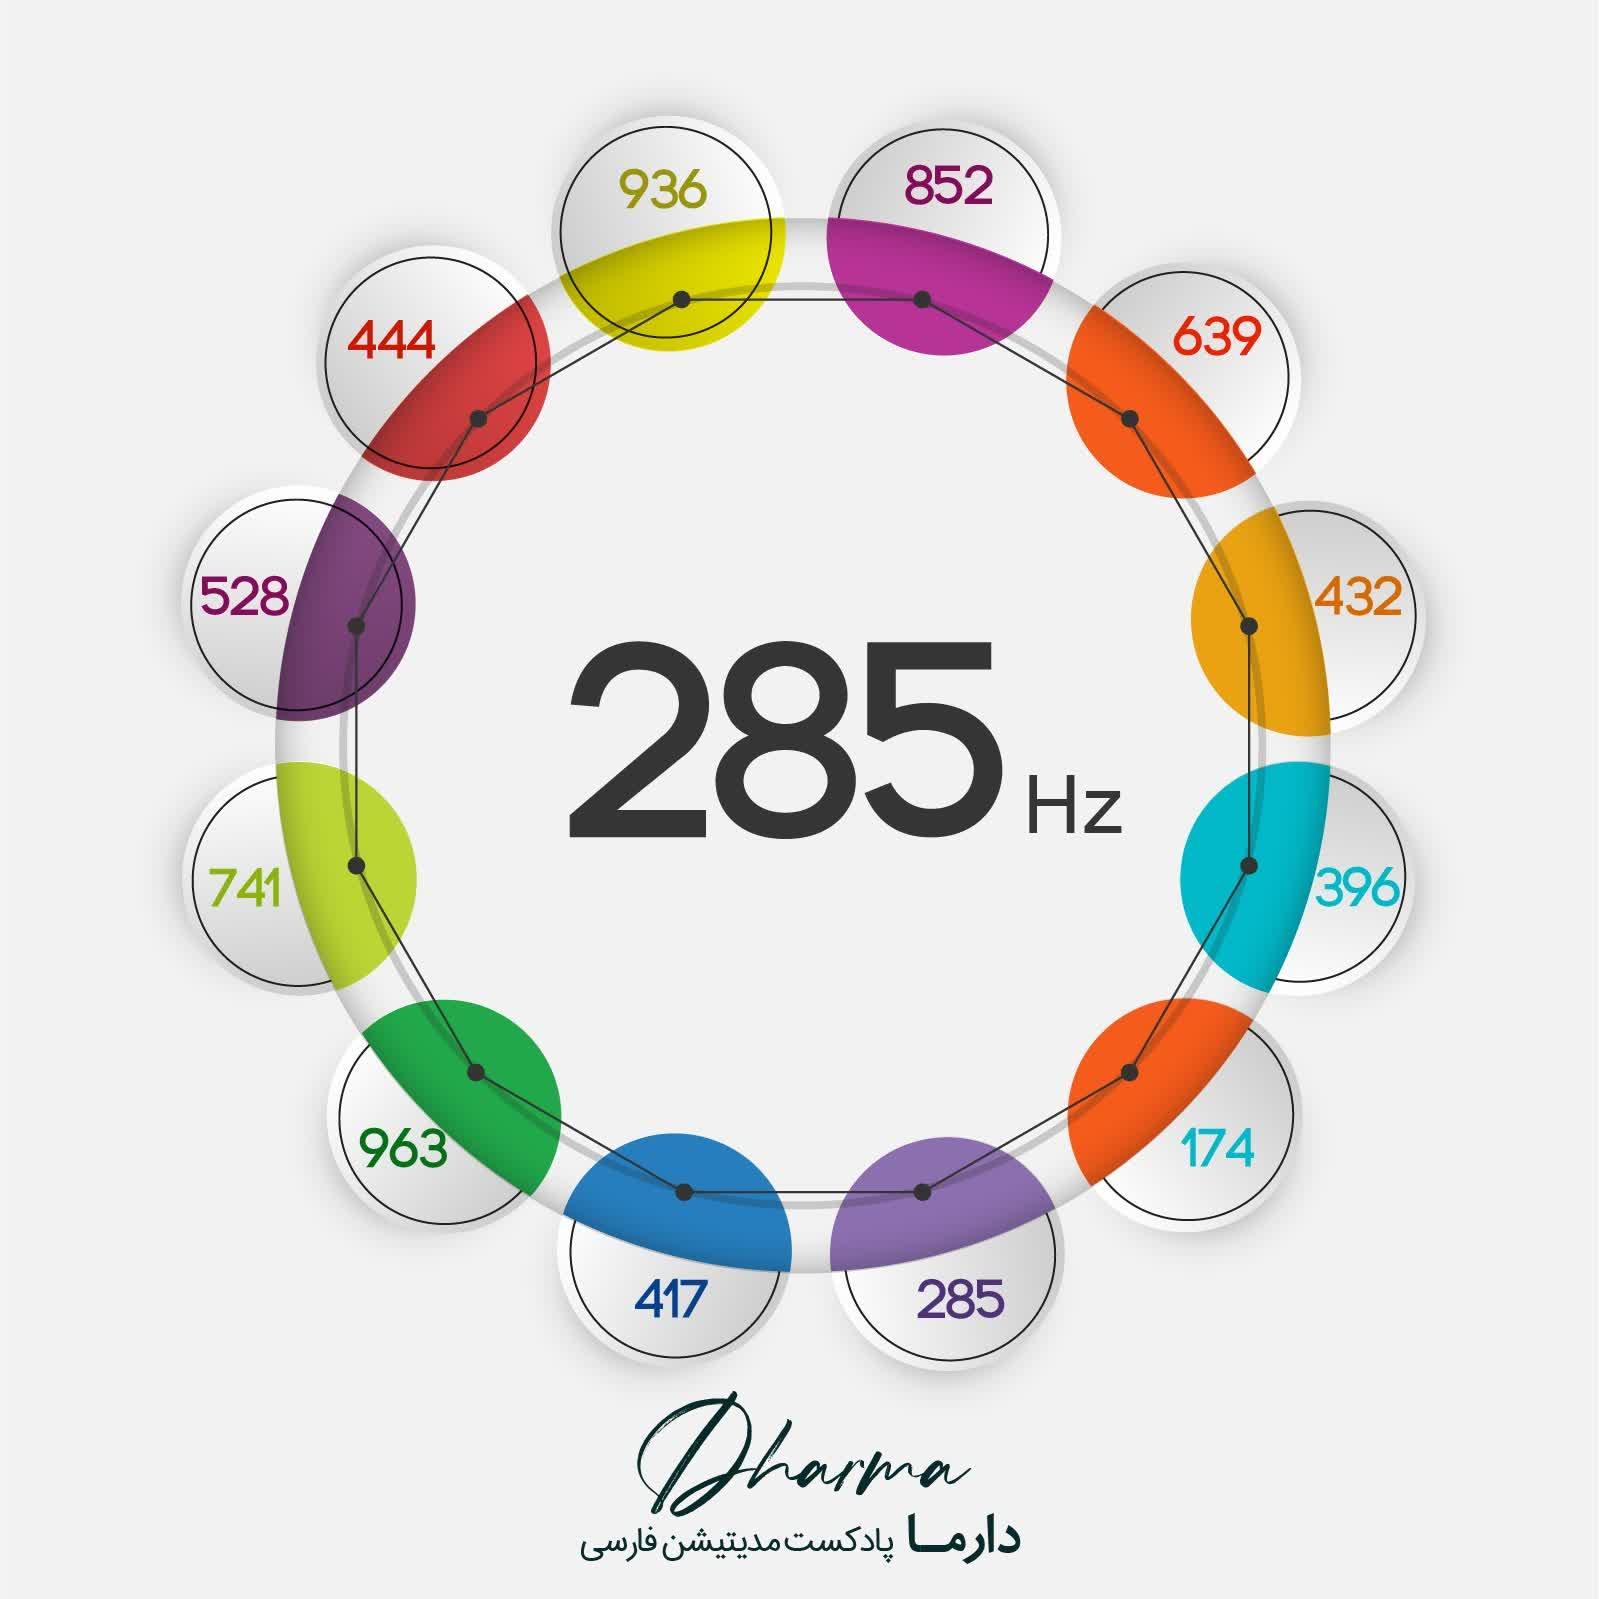 285Hz - فرکانس 285 هرتز